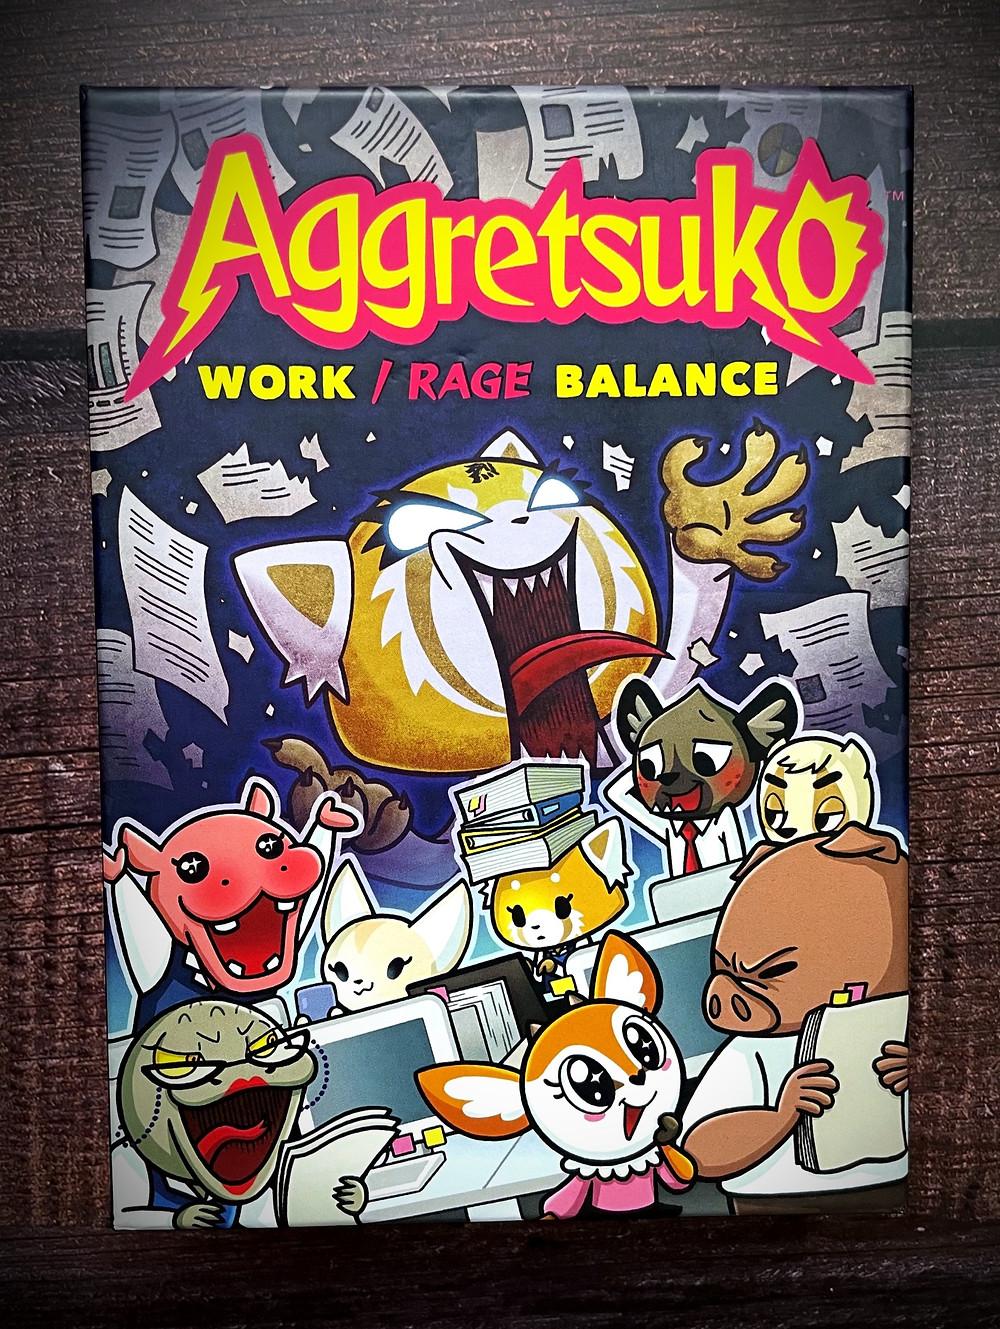 Aggretsuko: Work/ Rage Balance Box